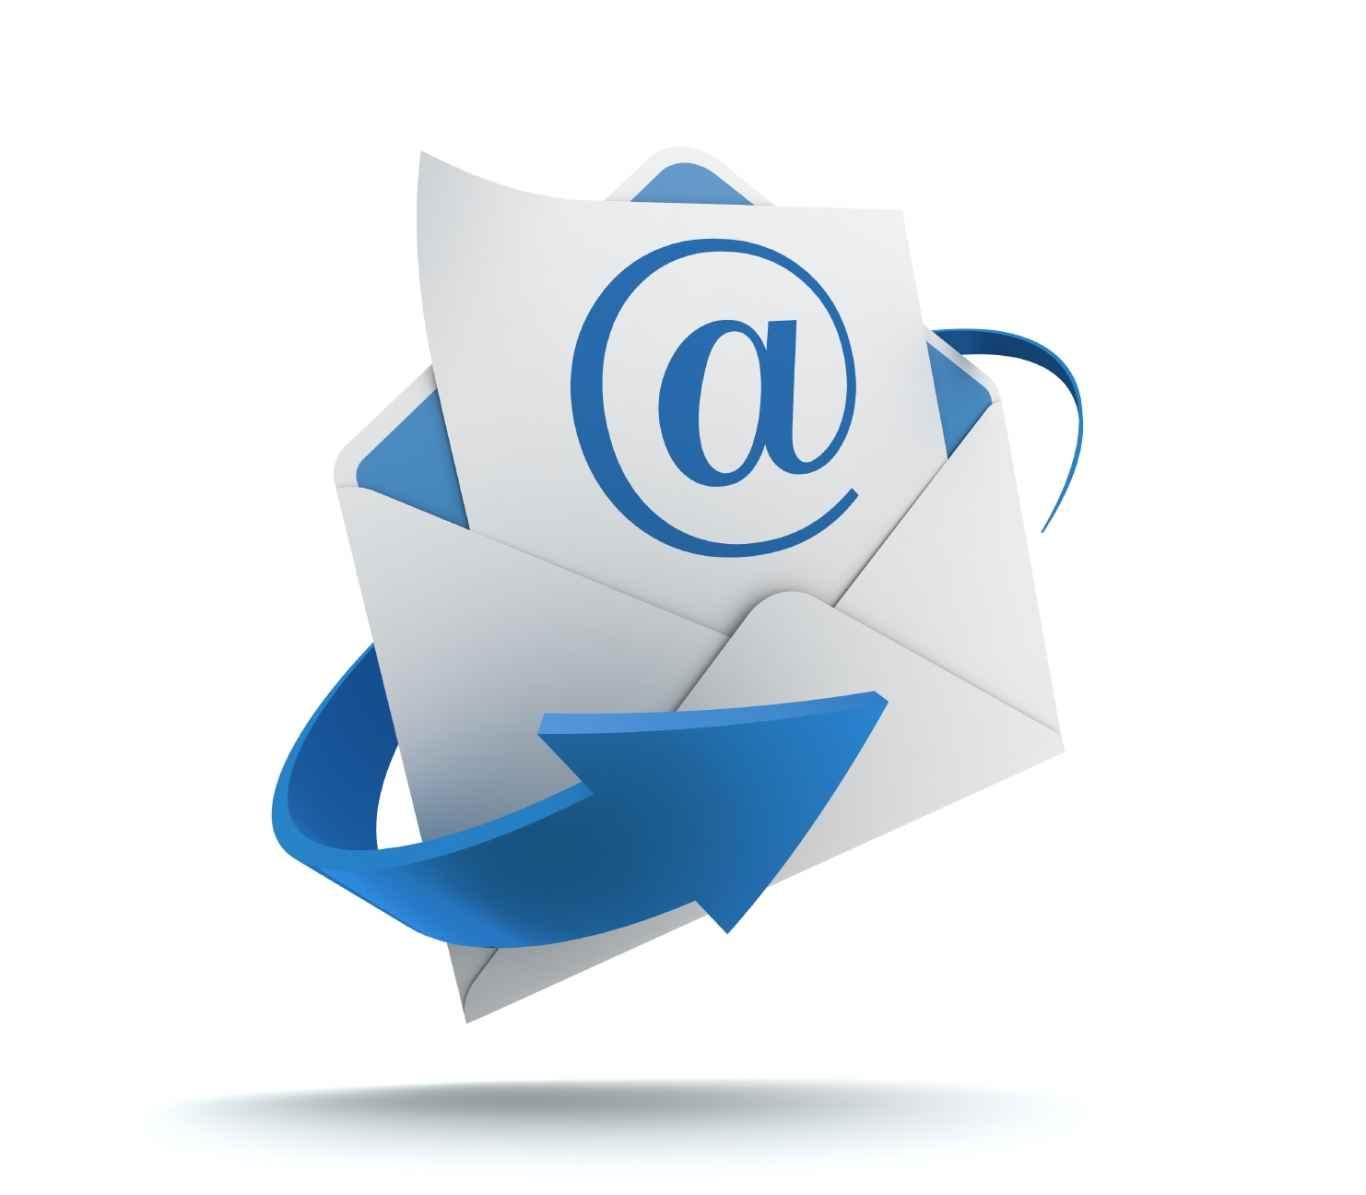 Rejestracja za pomocą adresu e-mail